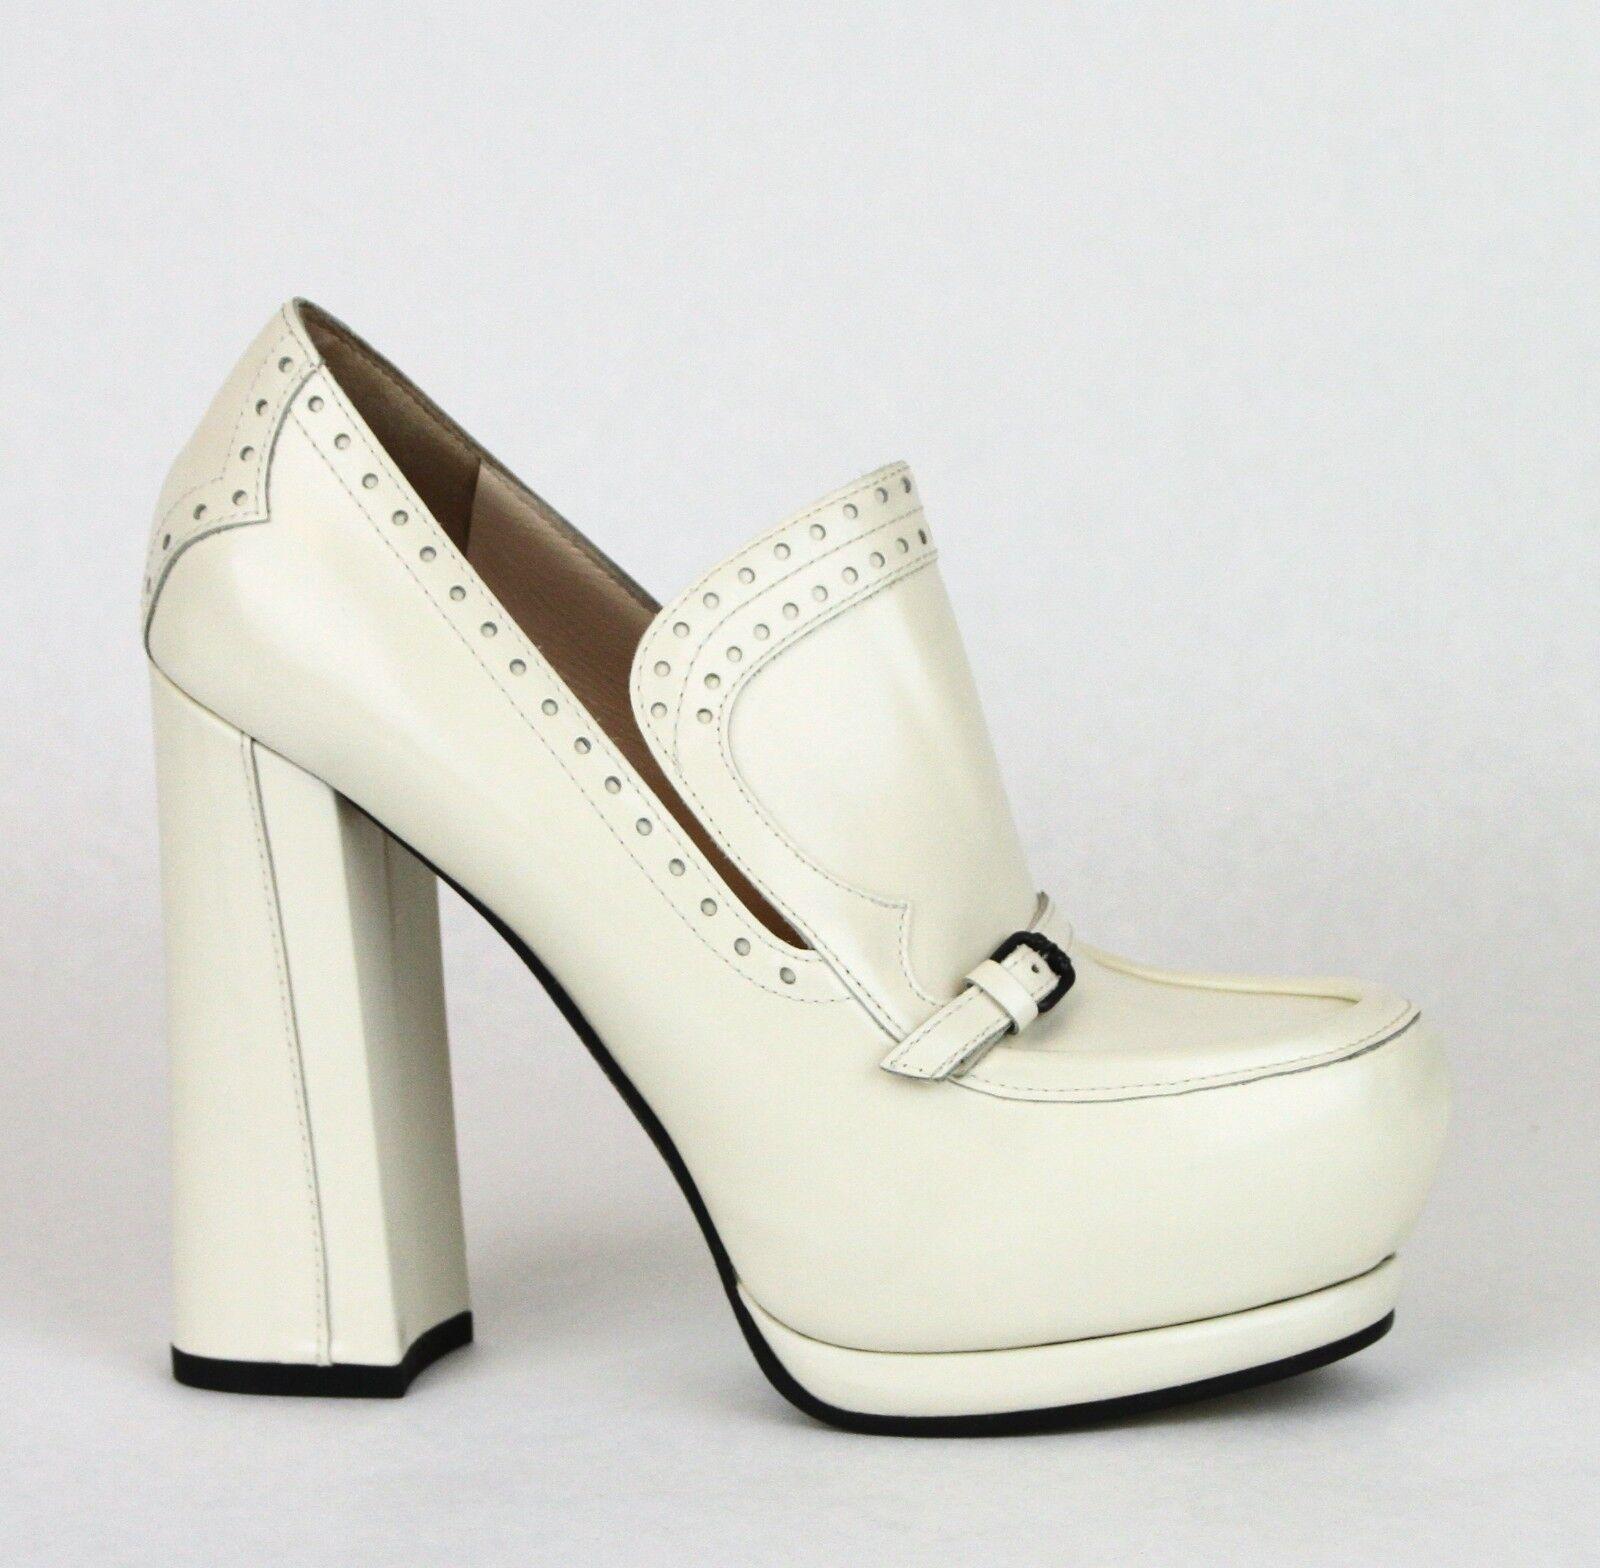 1050 New Authentic BOTTEGA VENETA Leather Platform Heel Pump White 331391 9902